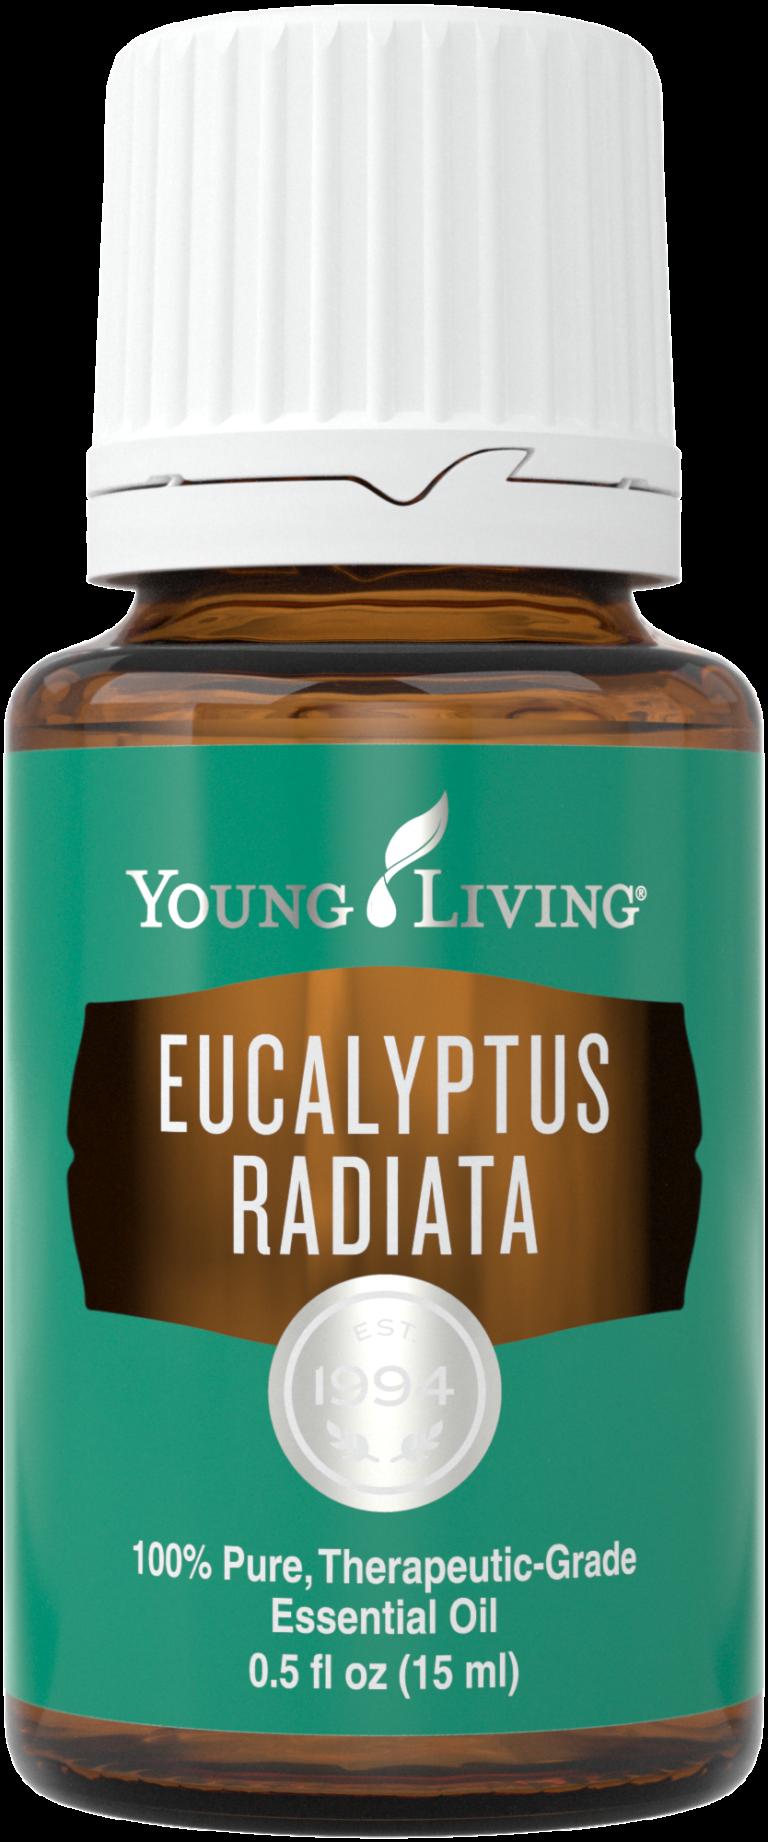 eucalyptusradiata_15ml_silo_us_2016_24419032112_o